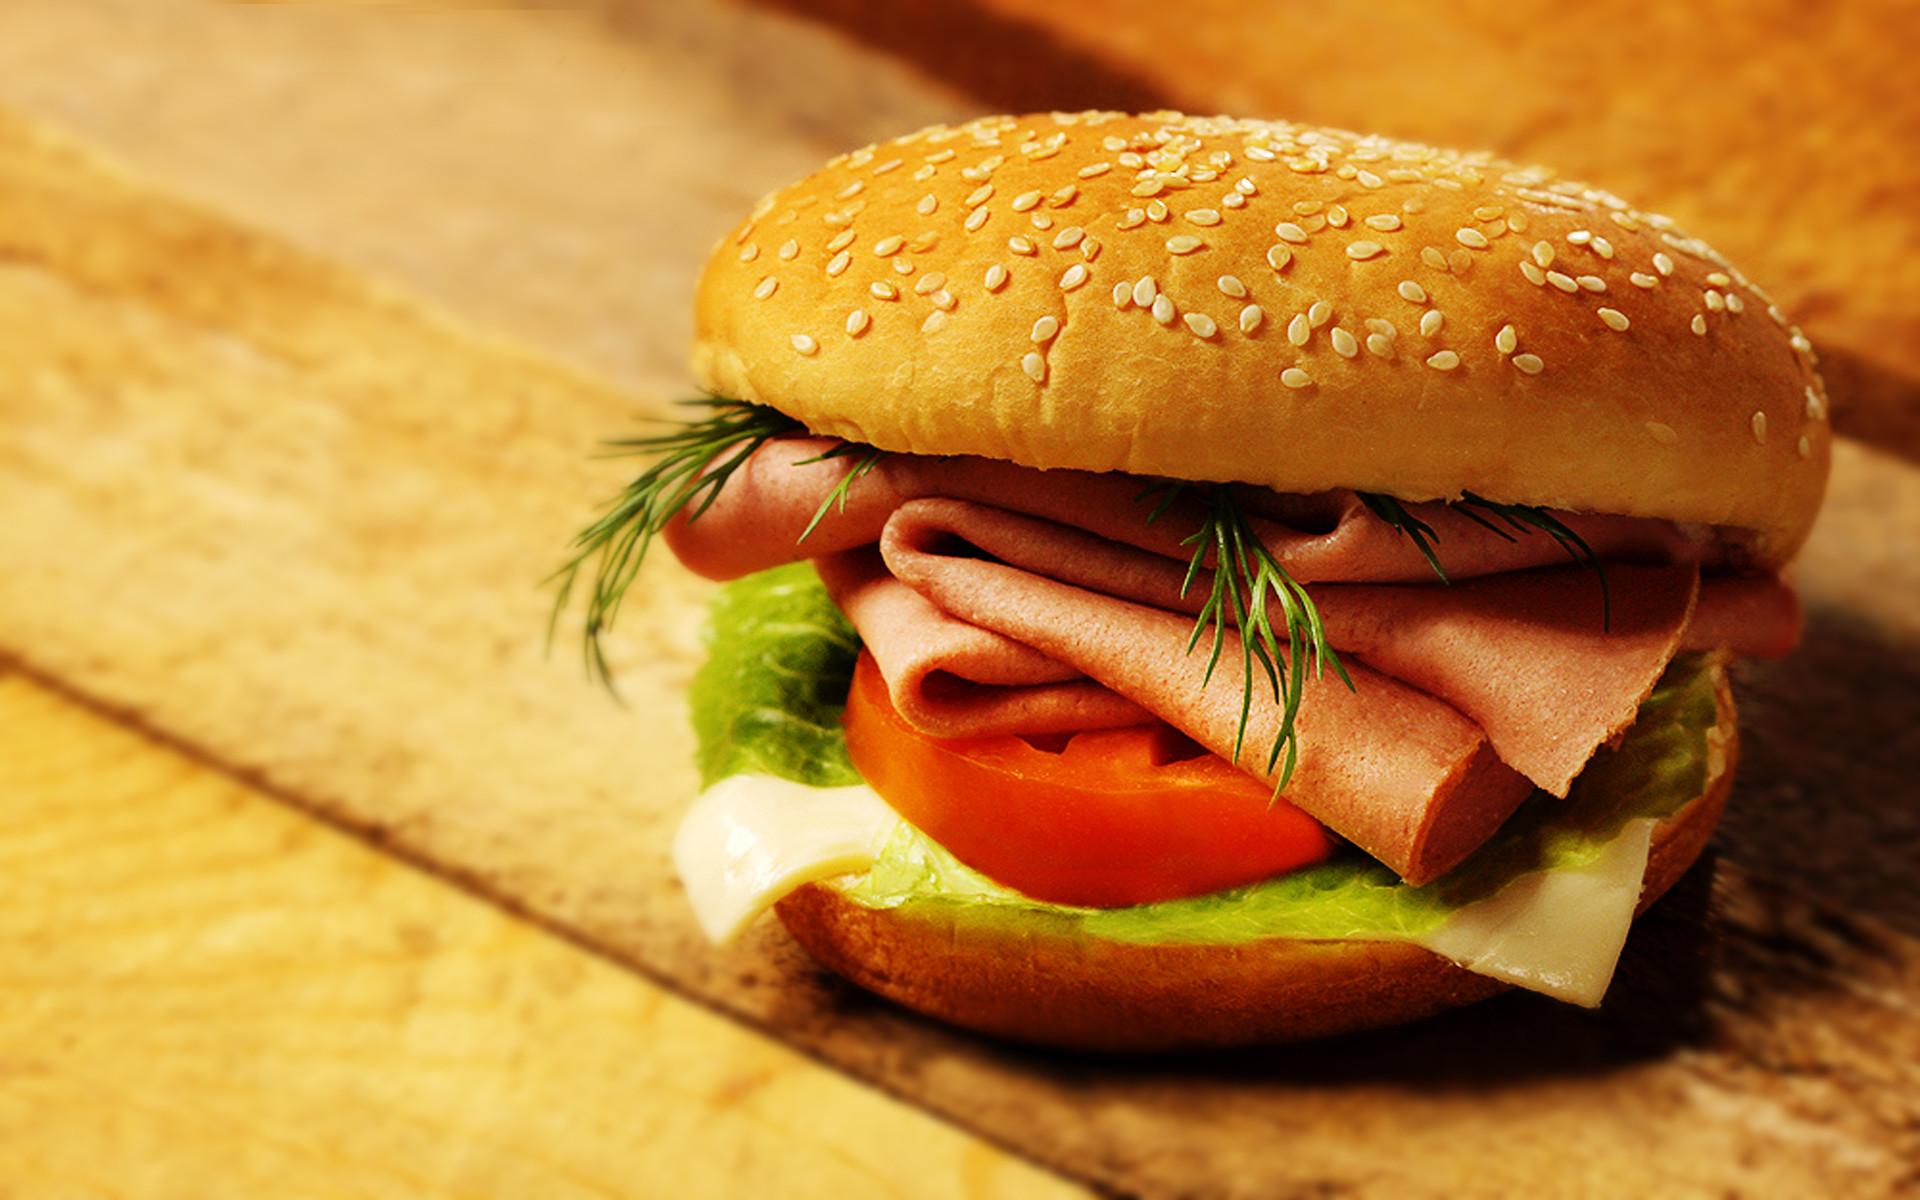 Good Wallpaper High Quality Burger - 854970-free-cheeseburger-wallpaper-1920x1200-xiaomi  Picture_552947.jpg